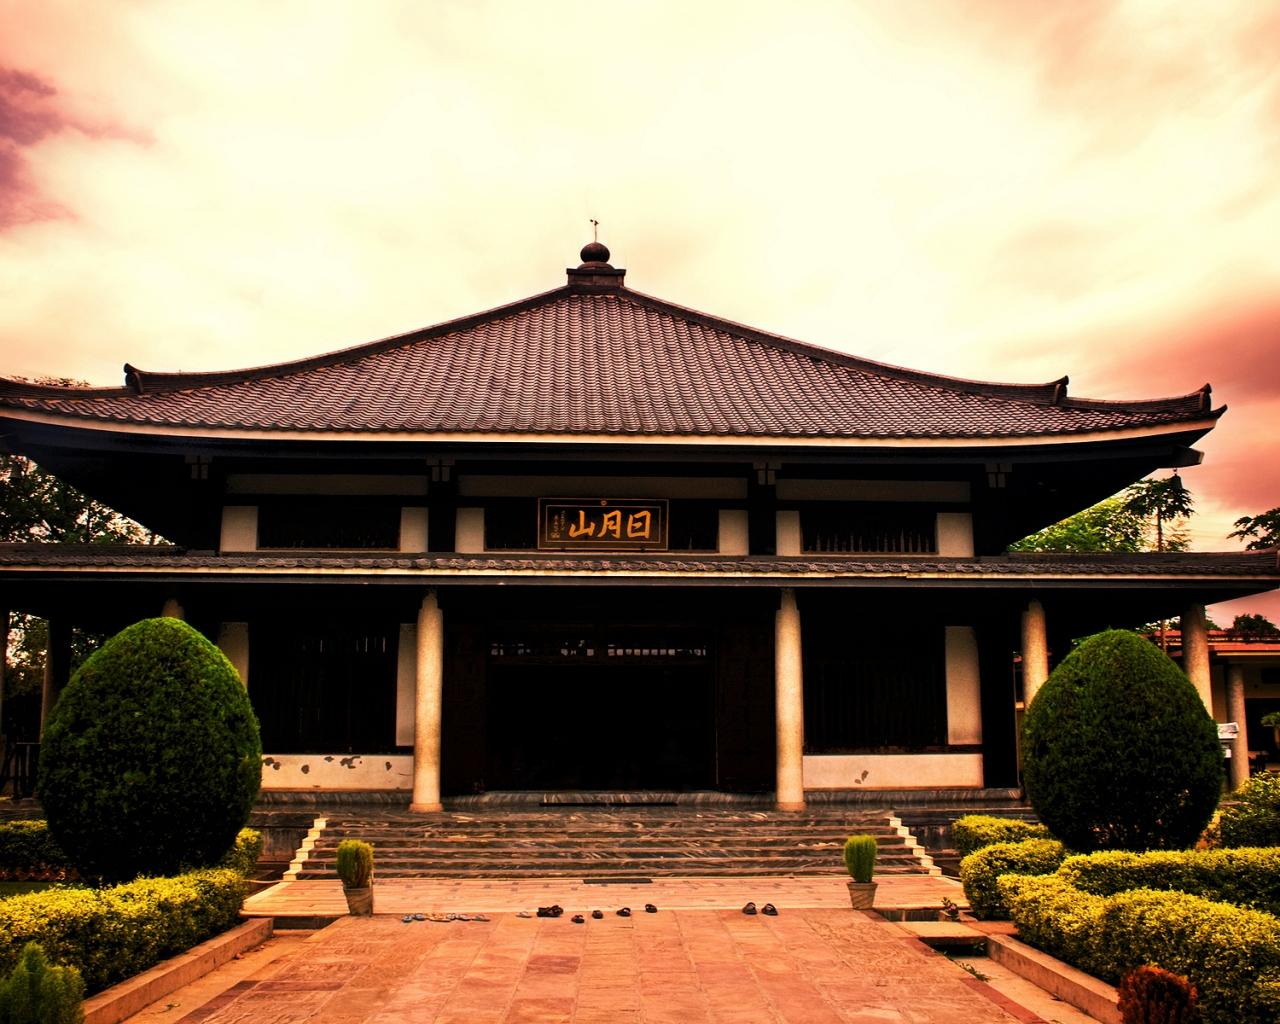 Modelo de casas de japon antiguas - 1280x1024